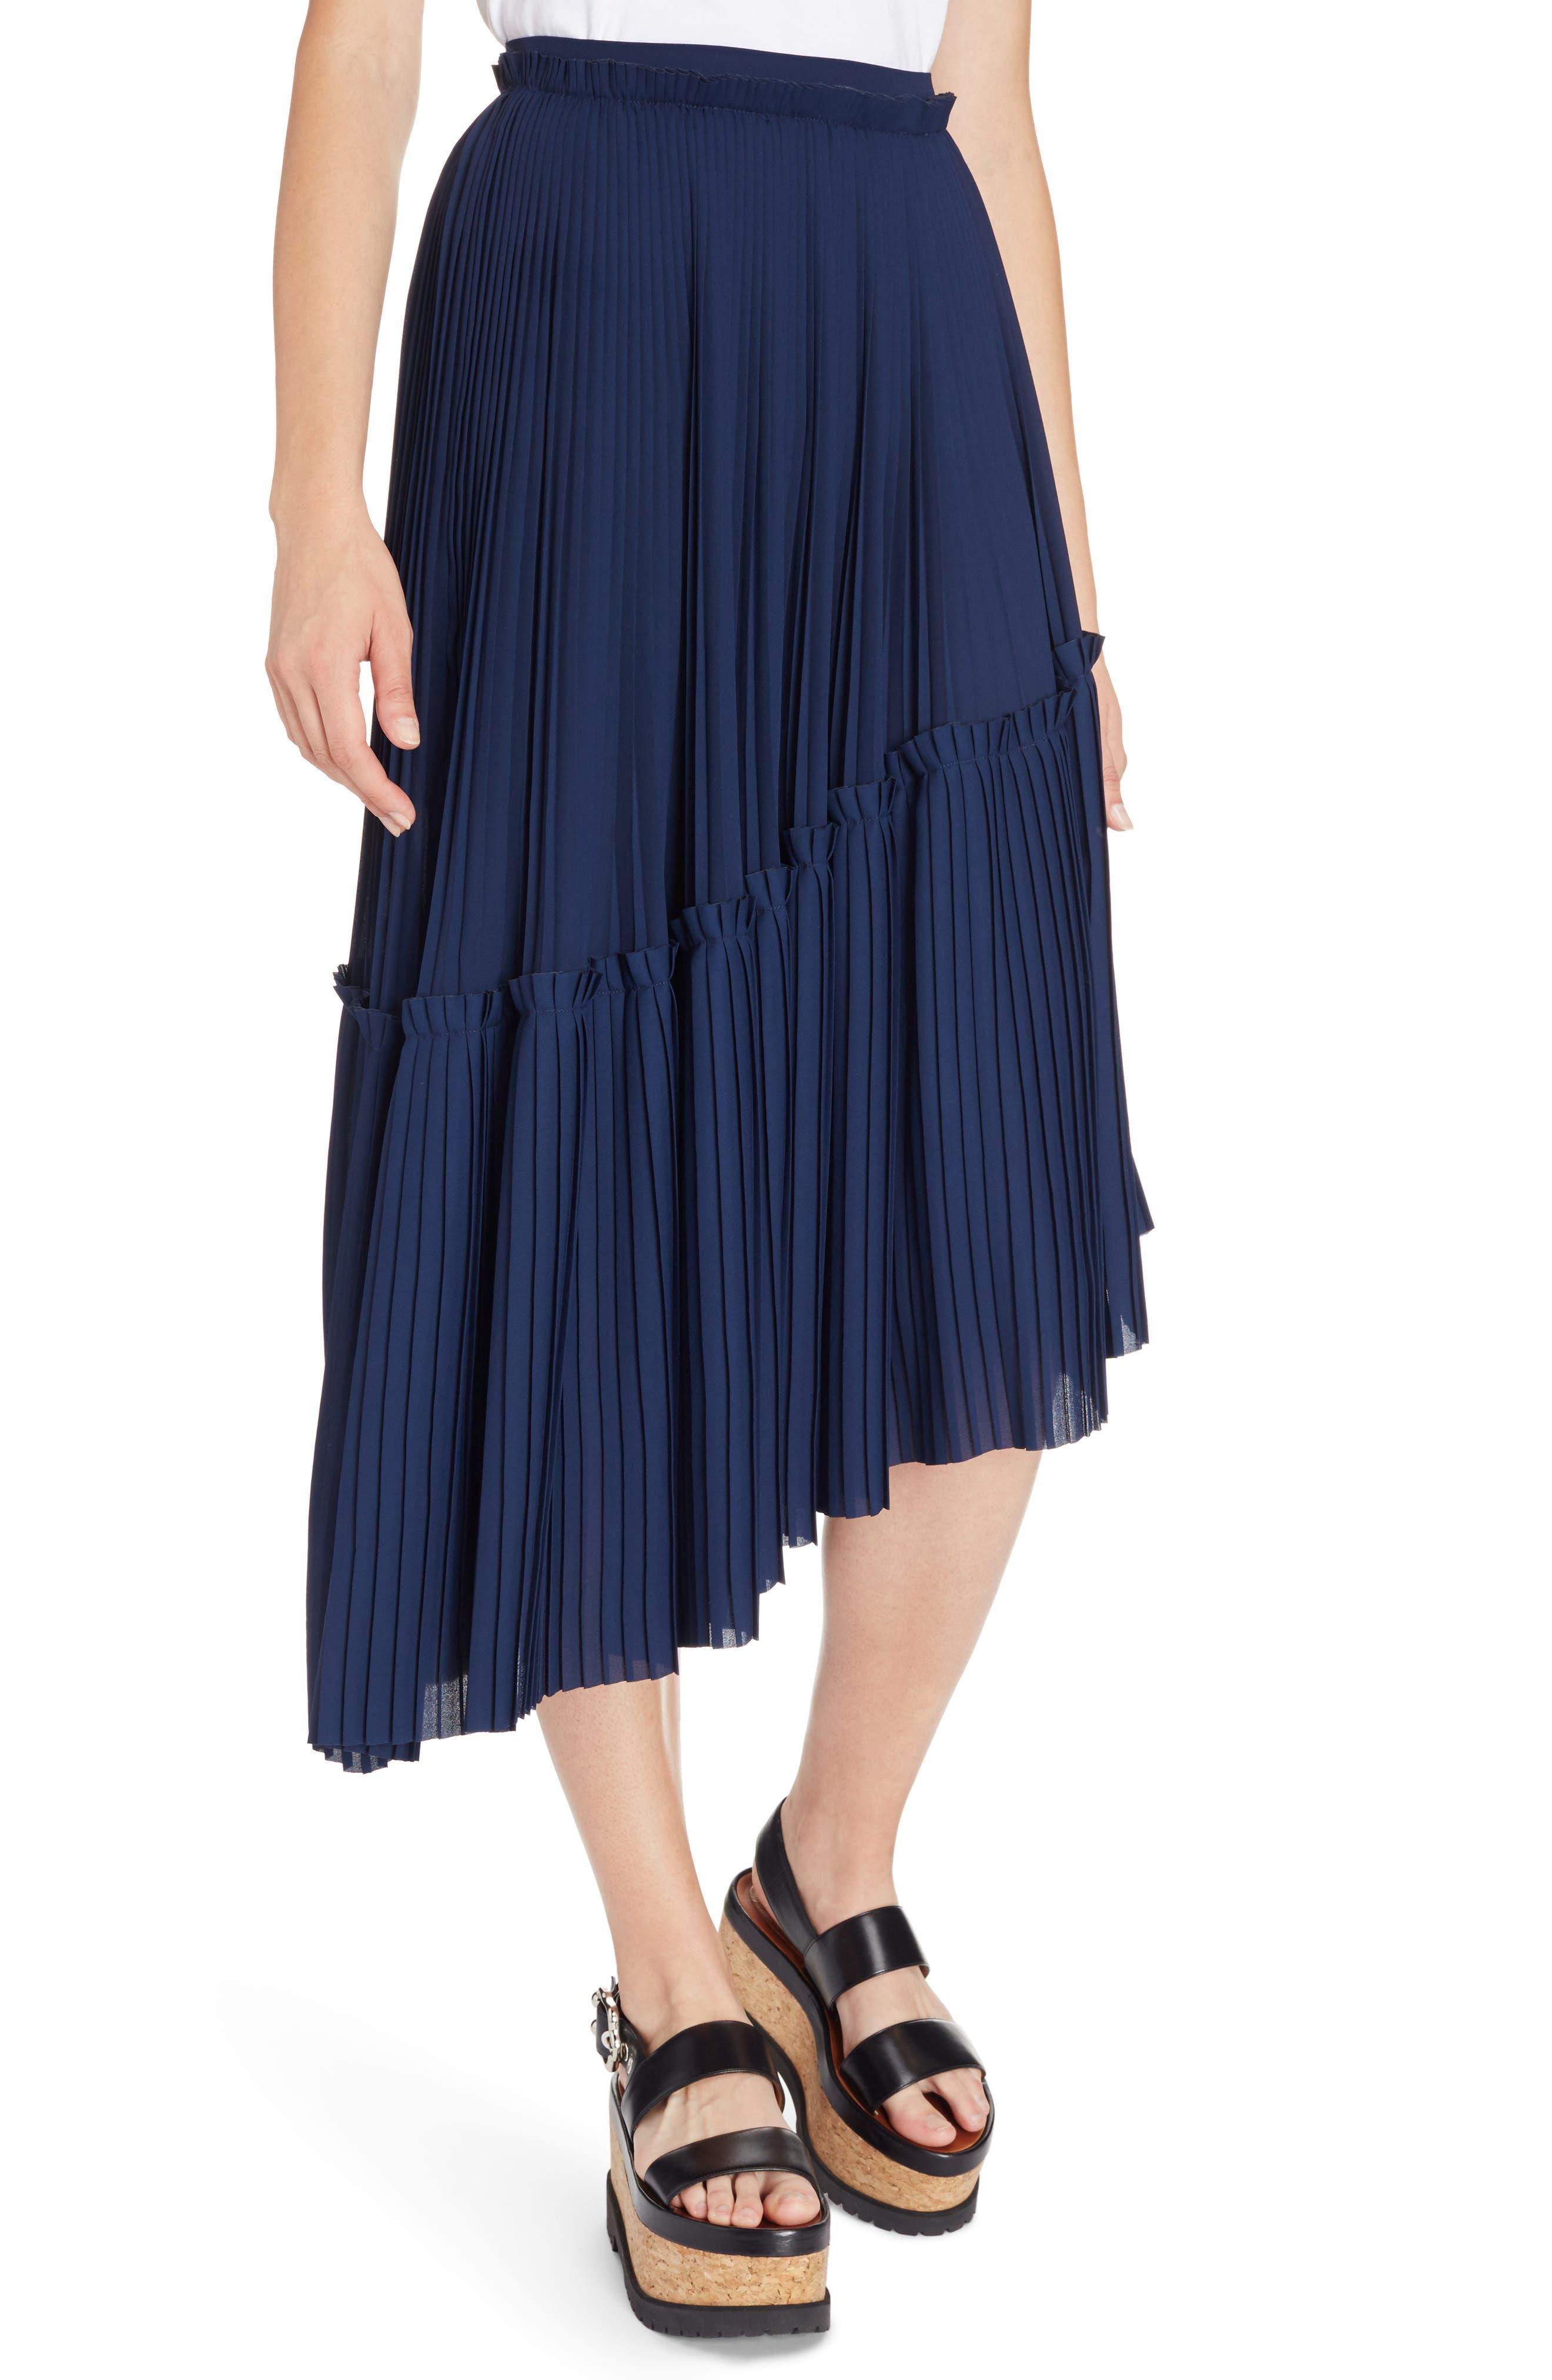 Alternate Image 1 Selected - KENZO Asymmetrical Pleated Midi Skirt